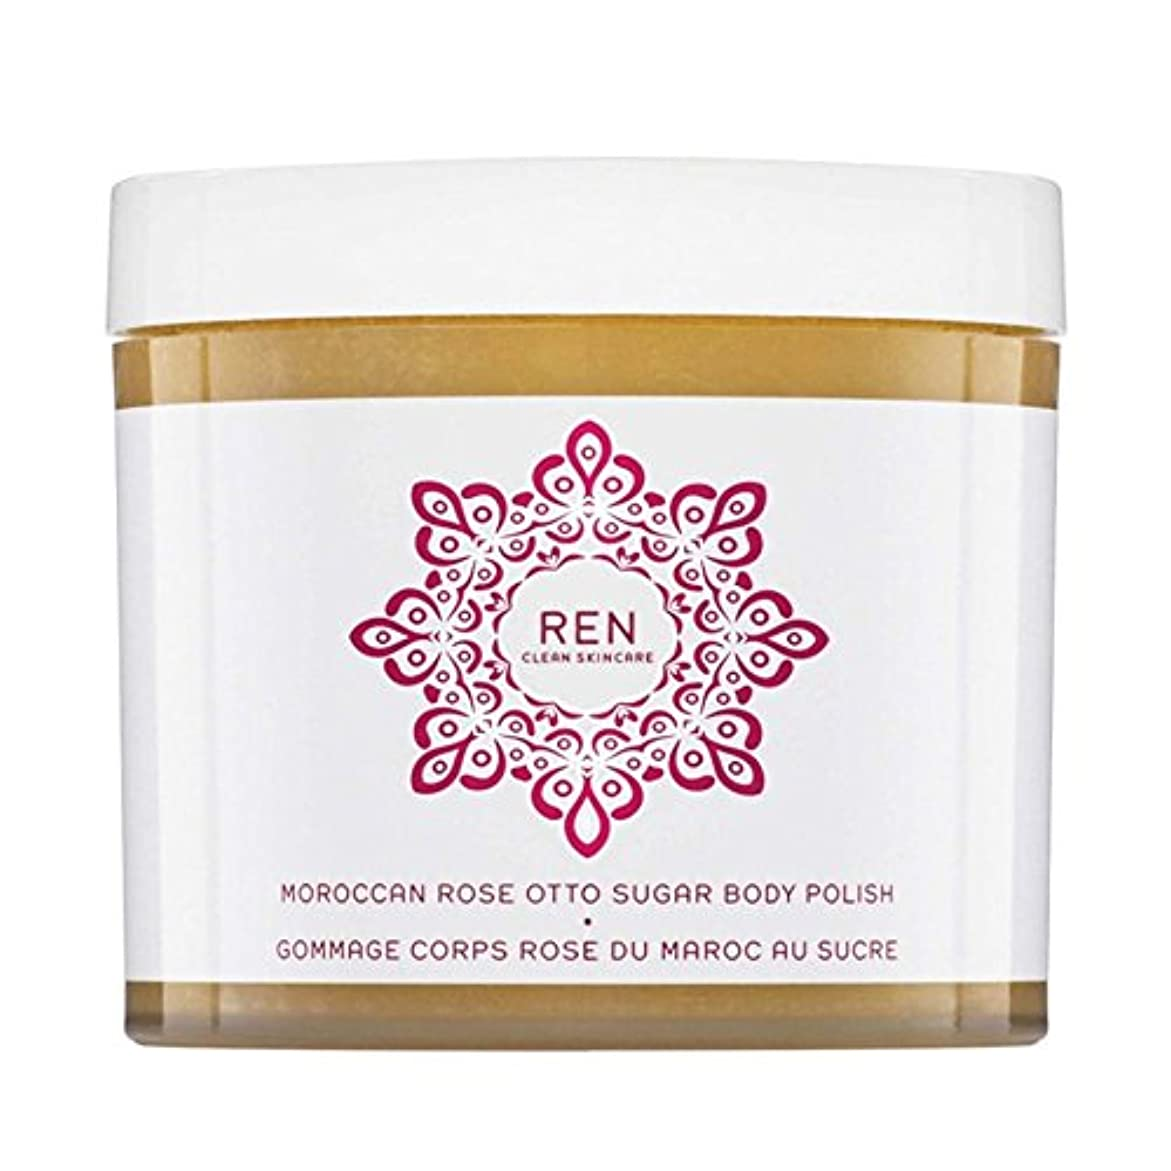 REN Moroccan Rose Otto Sugar Body Polish 330ml - モロッコは、糖体ポリッシュ330ミリリットルをオットーローズ [並行輸入品]